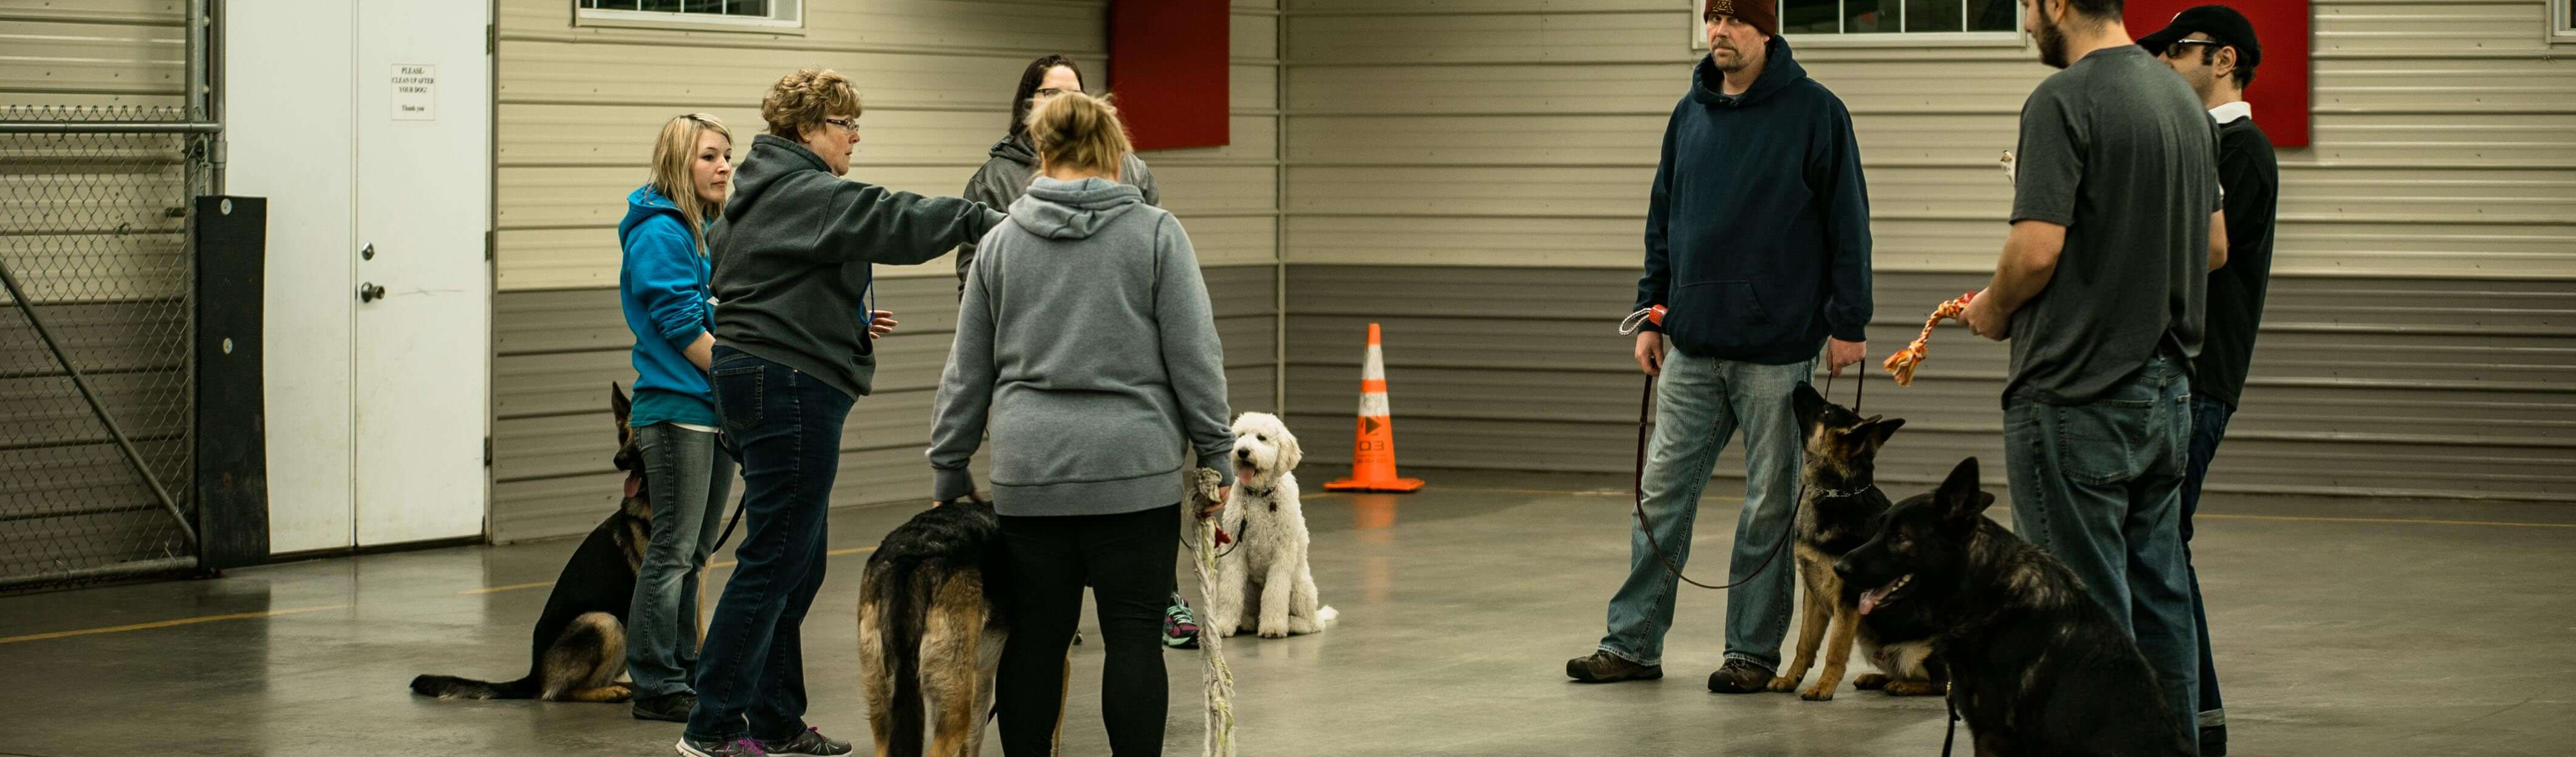 Dog Training   Sam & Danni's – St  Cloud, MN Area